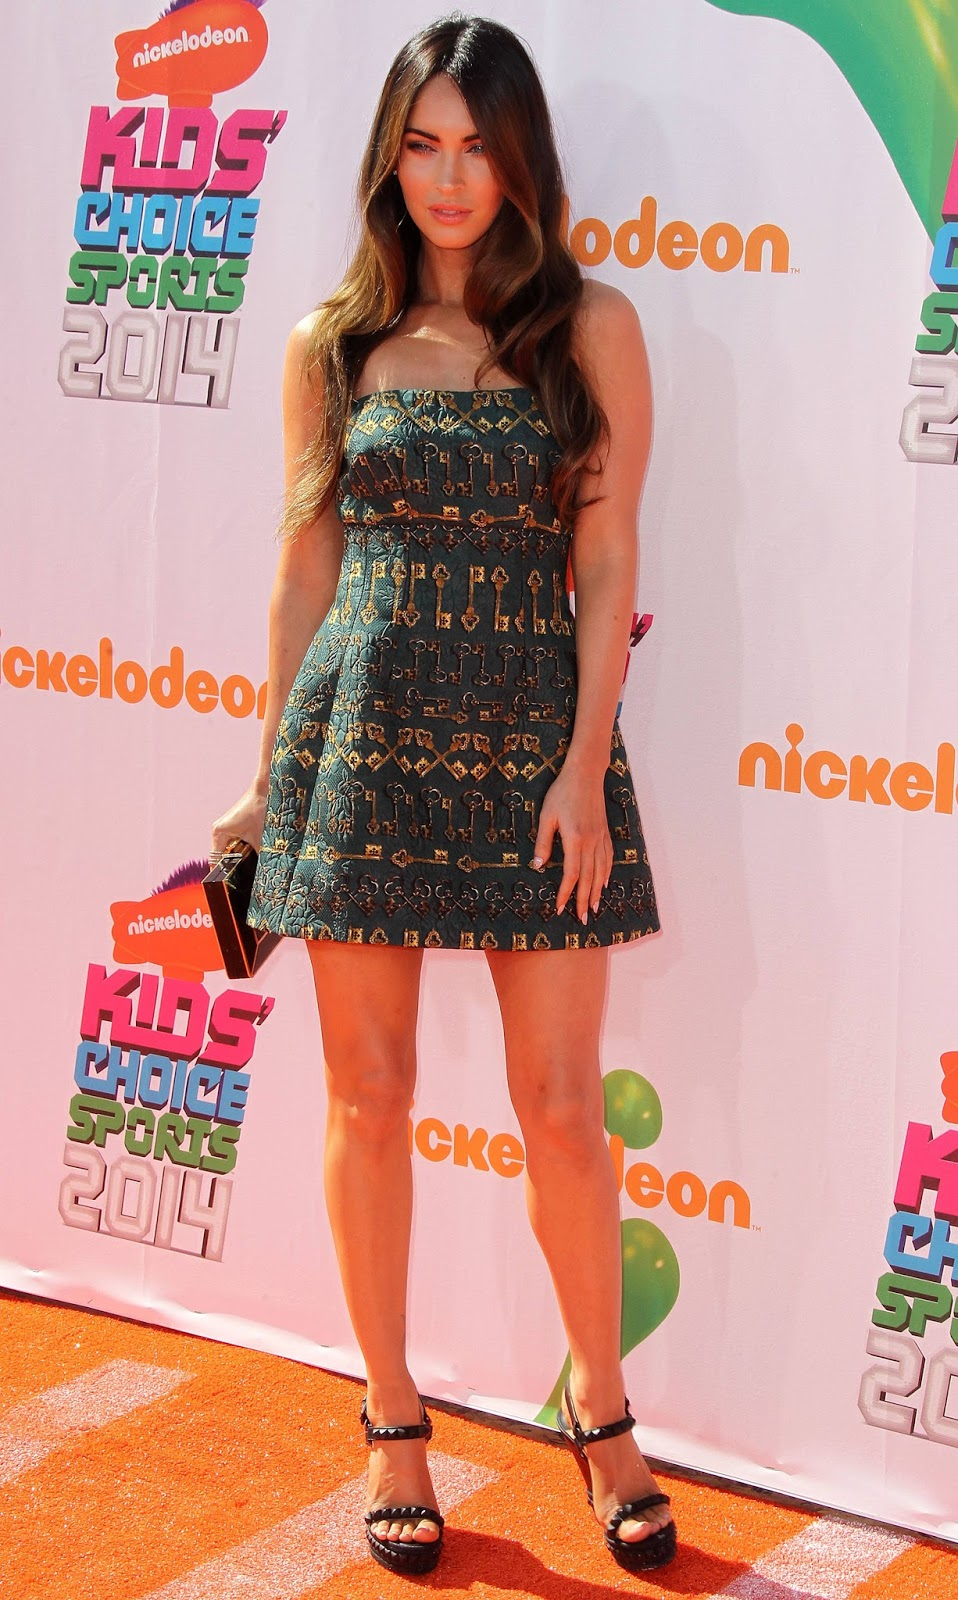 Megan Fox at the Kids Choice Sports Awards - Photos